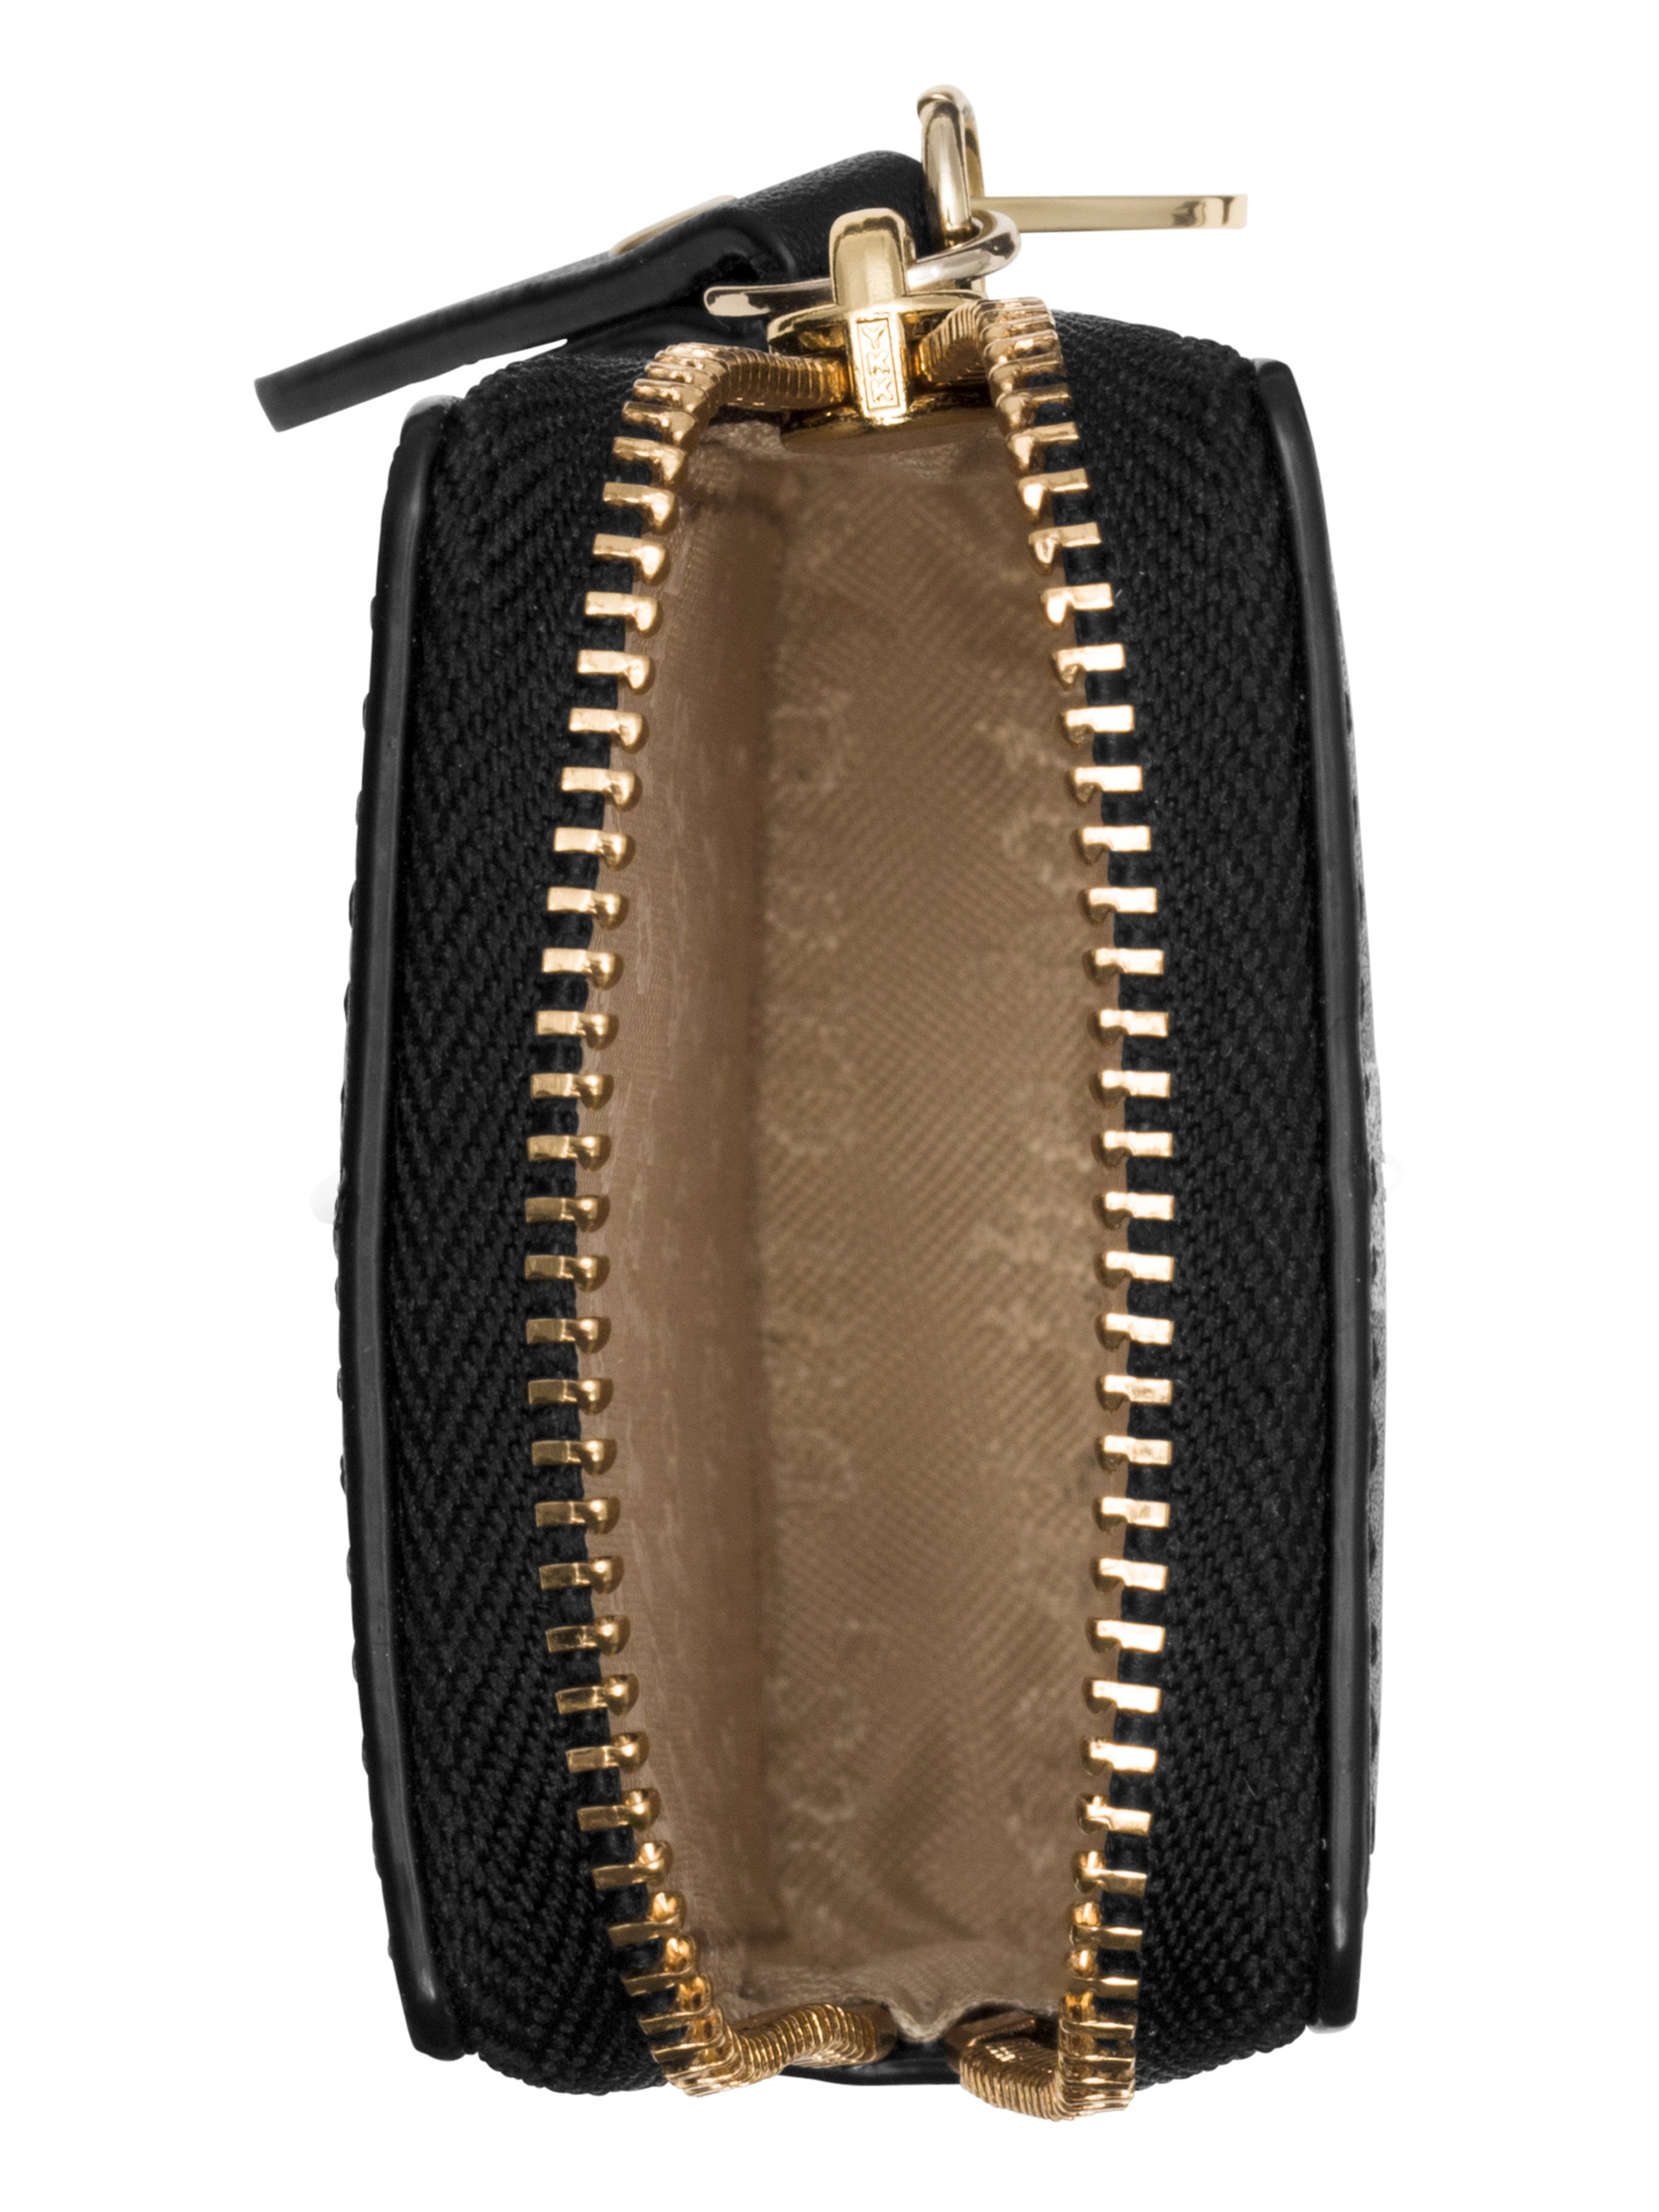 Kate Spade Brightspot Avenue Leather Wallet in Black - Lyst